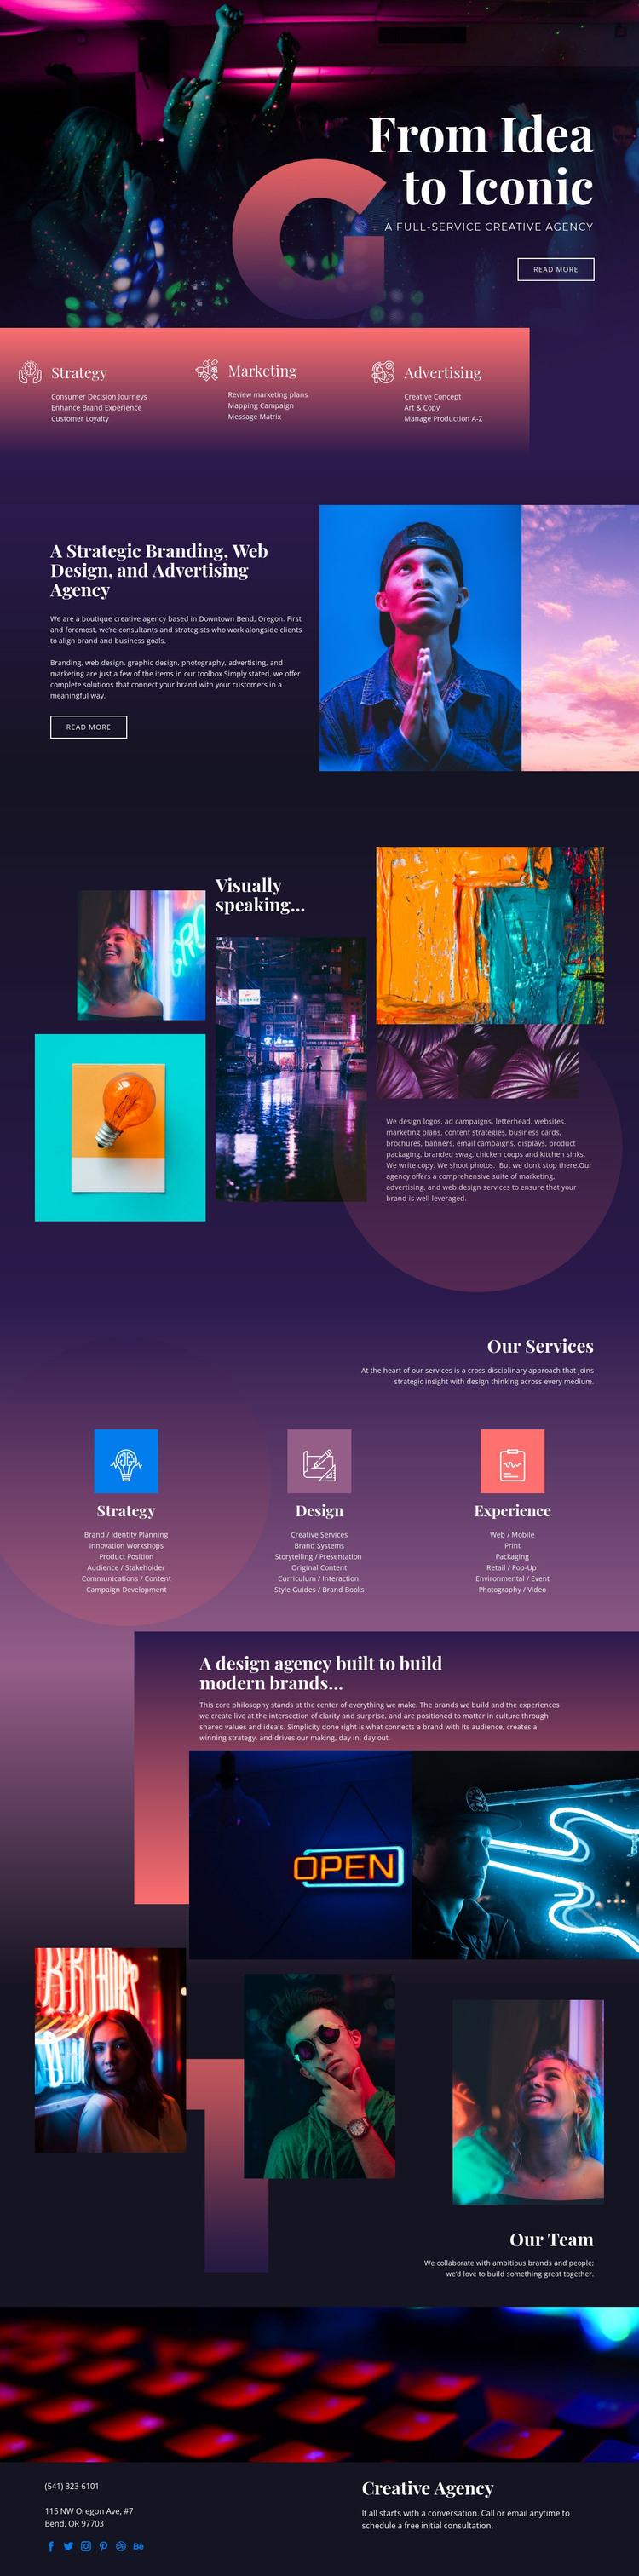 Iconic ideas of art Web Design